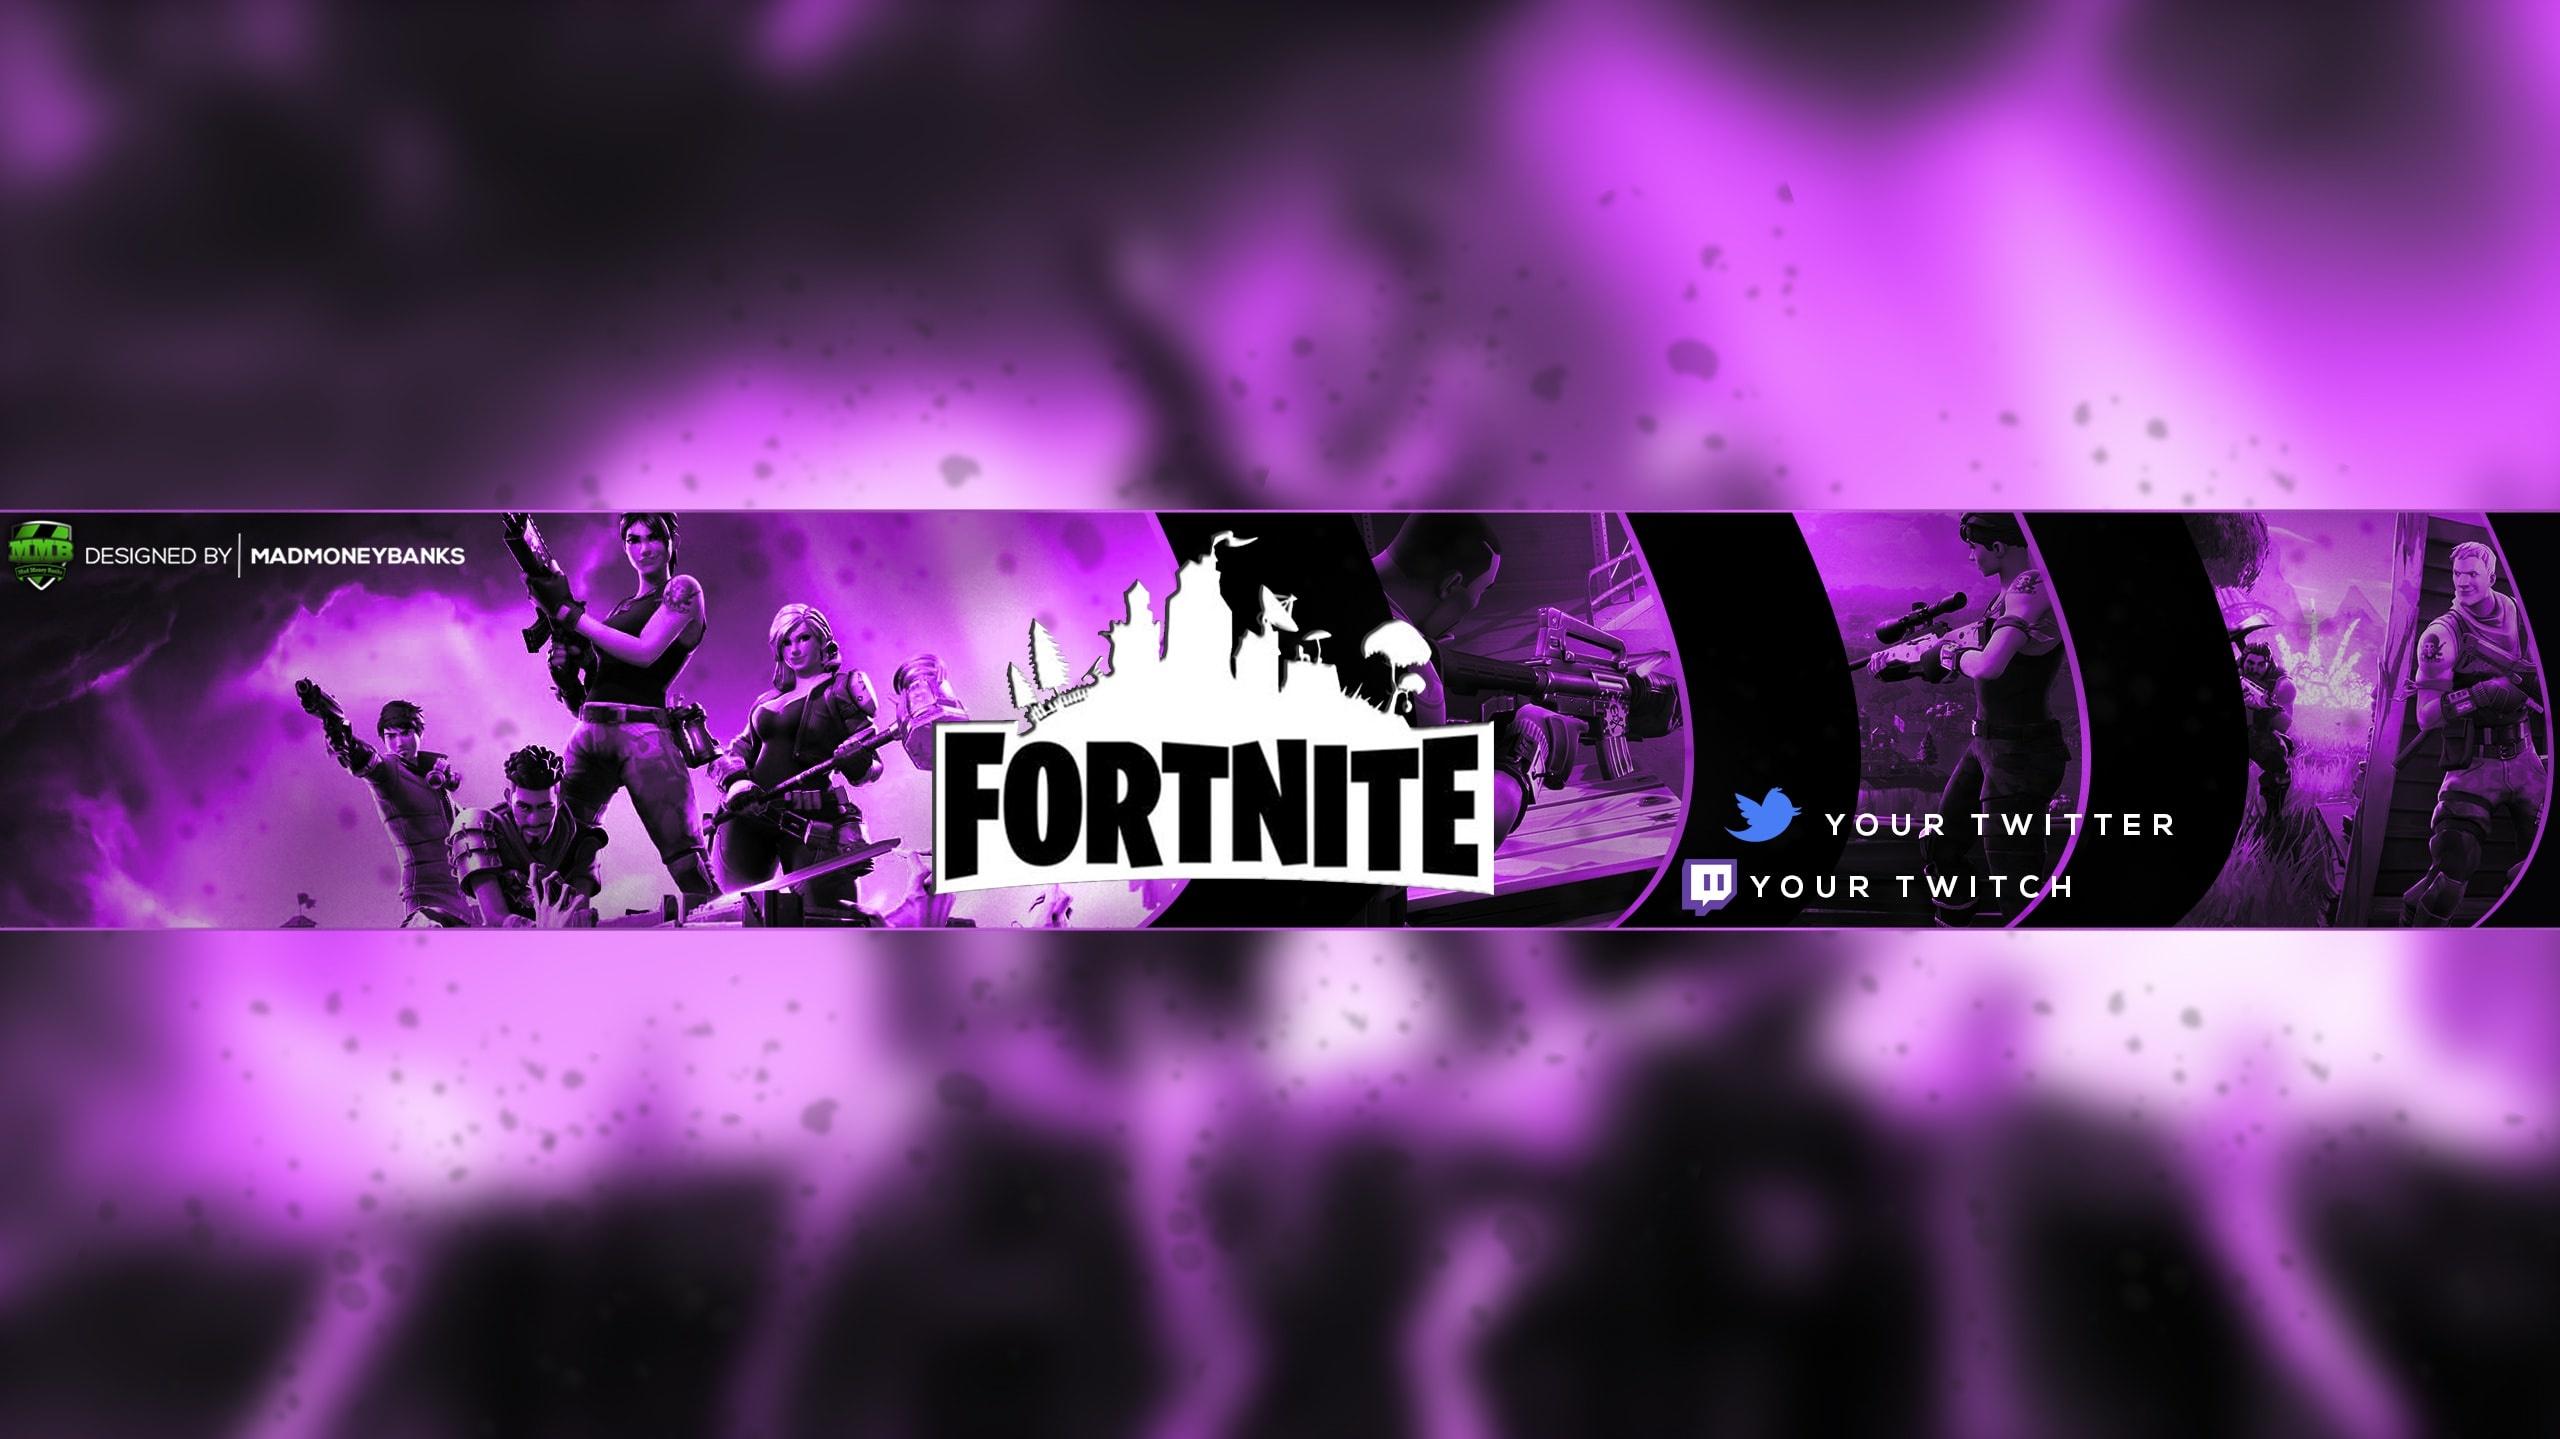 Cool Fortnite Youtube Banners